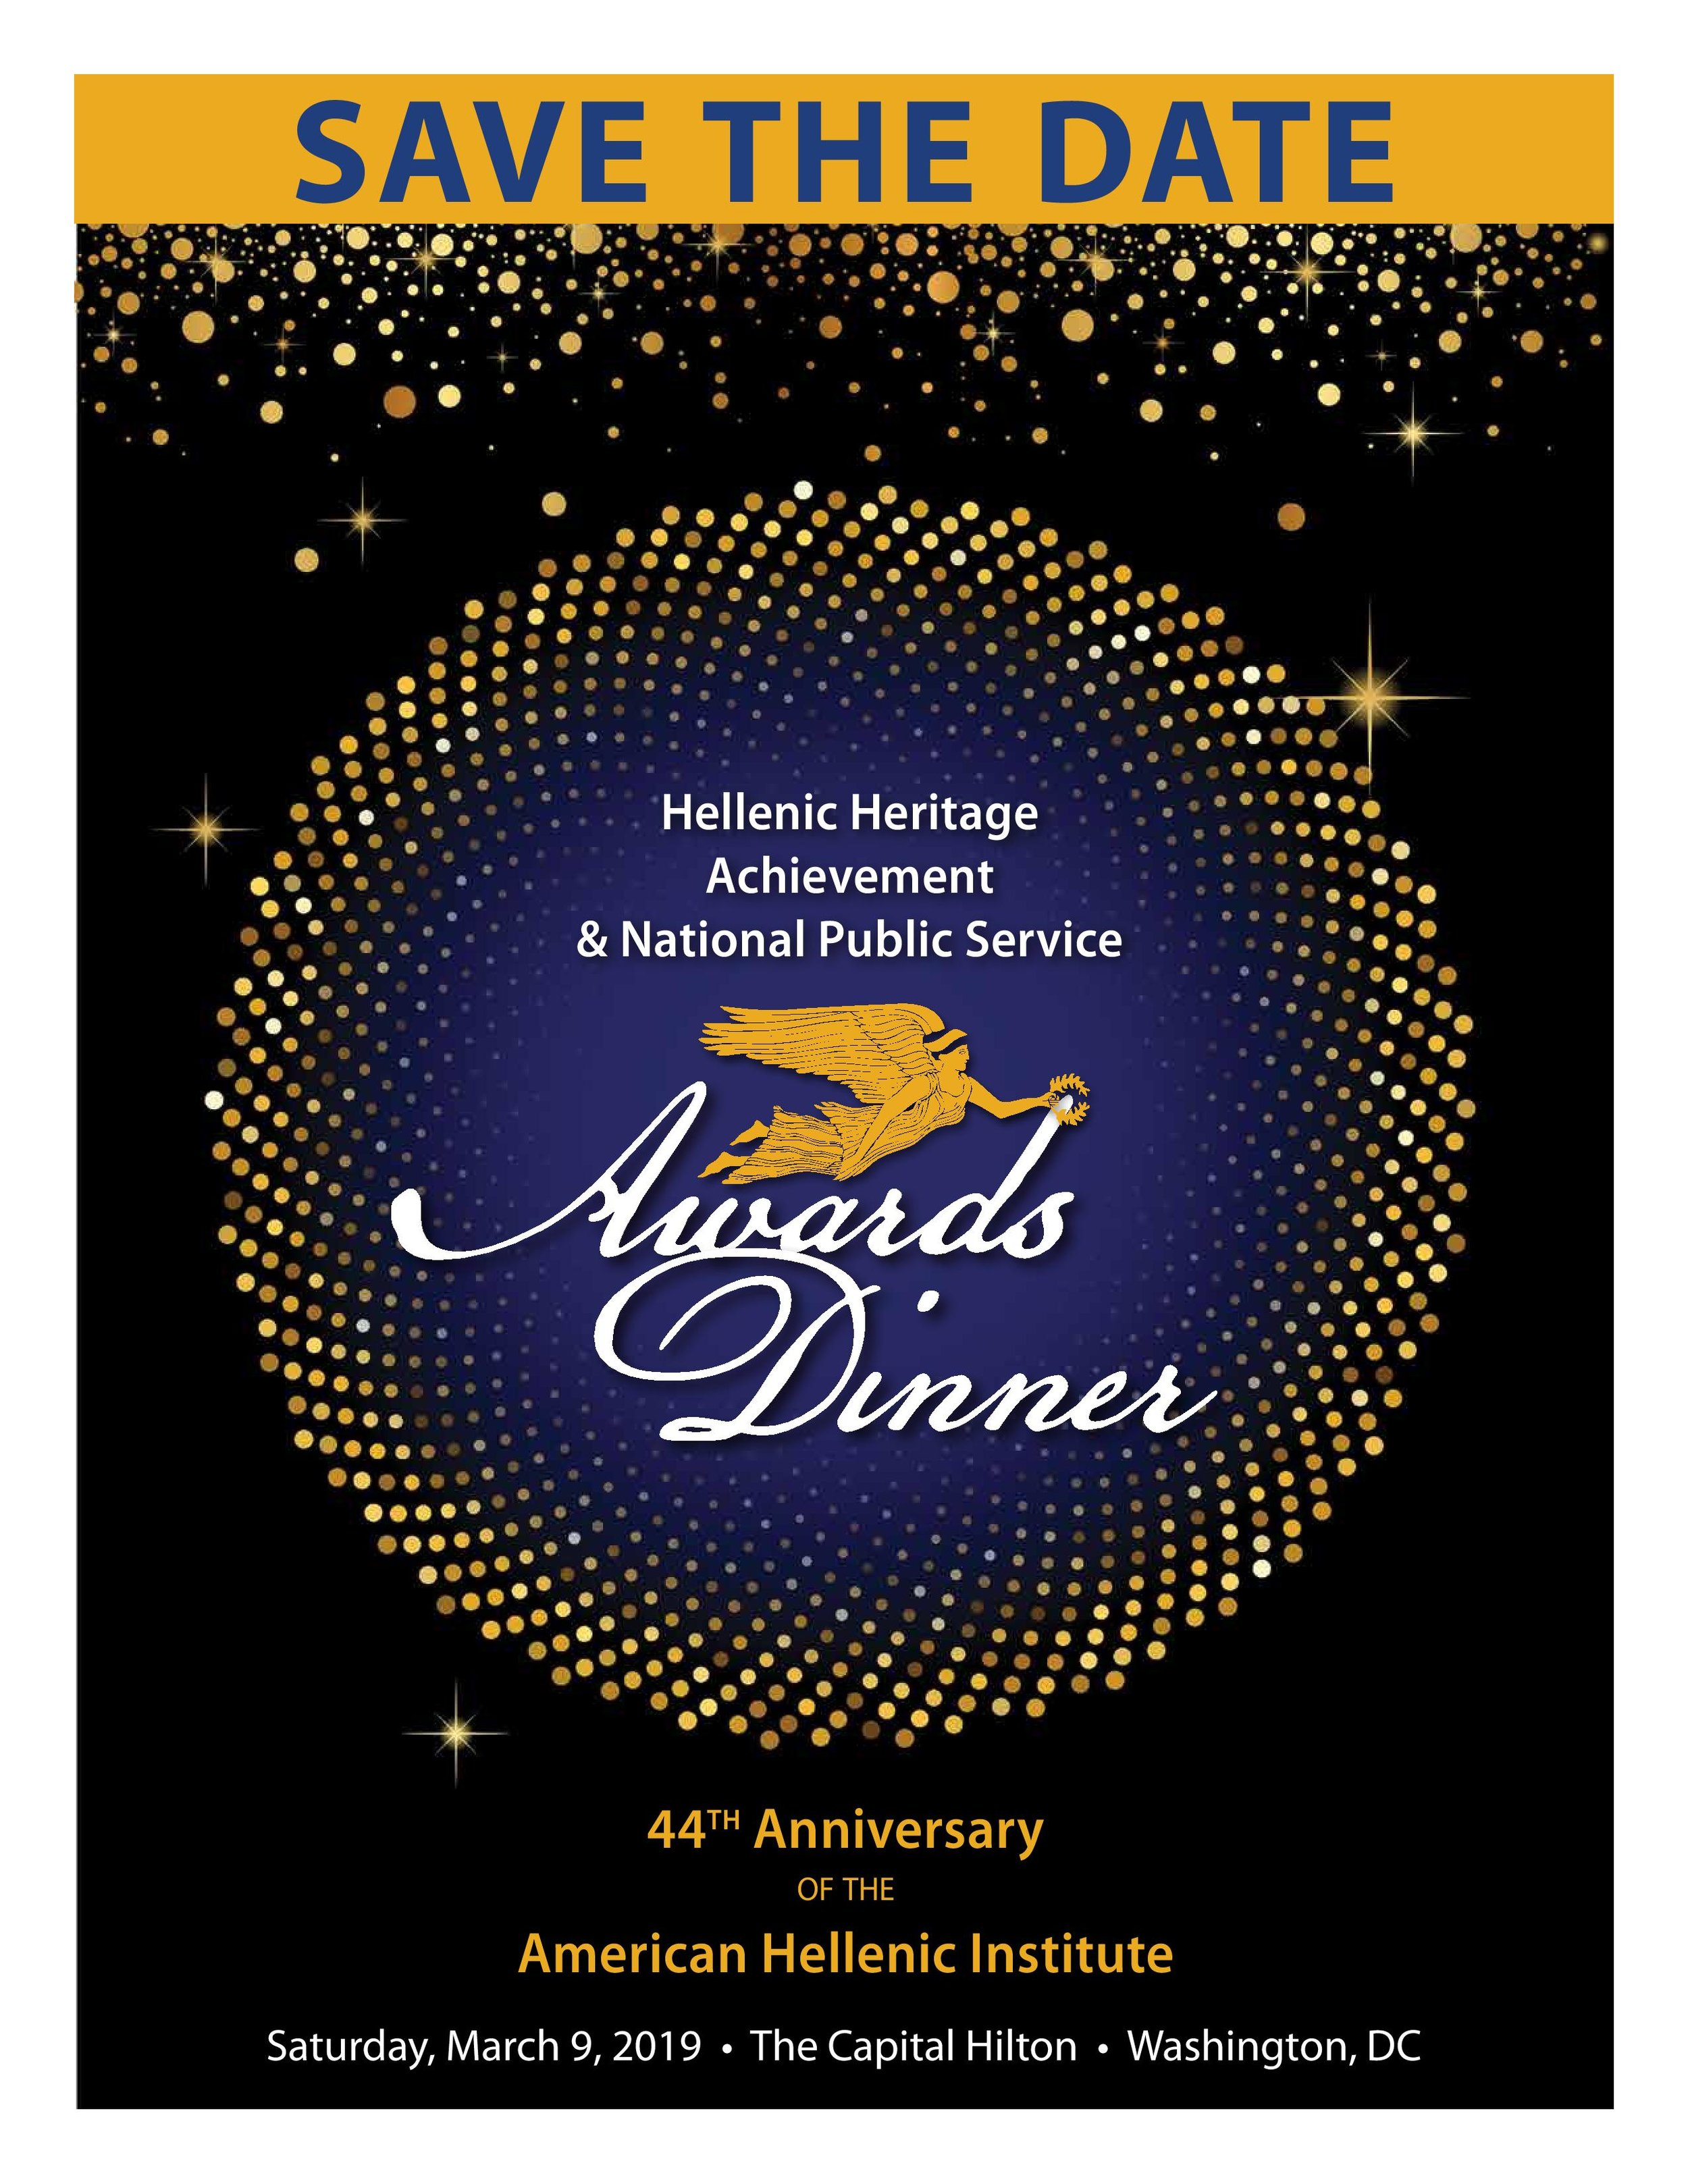 AHI-44 Awards Save the Date.jpg